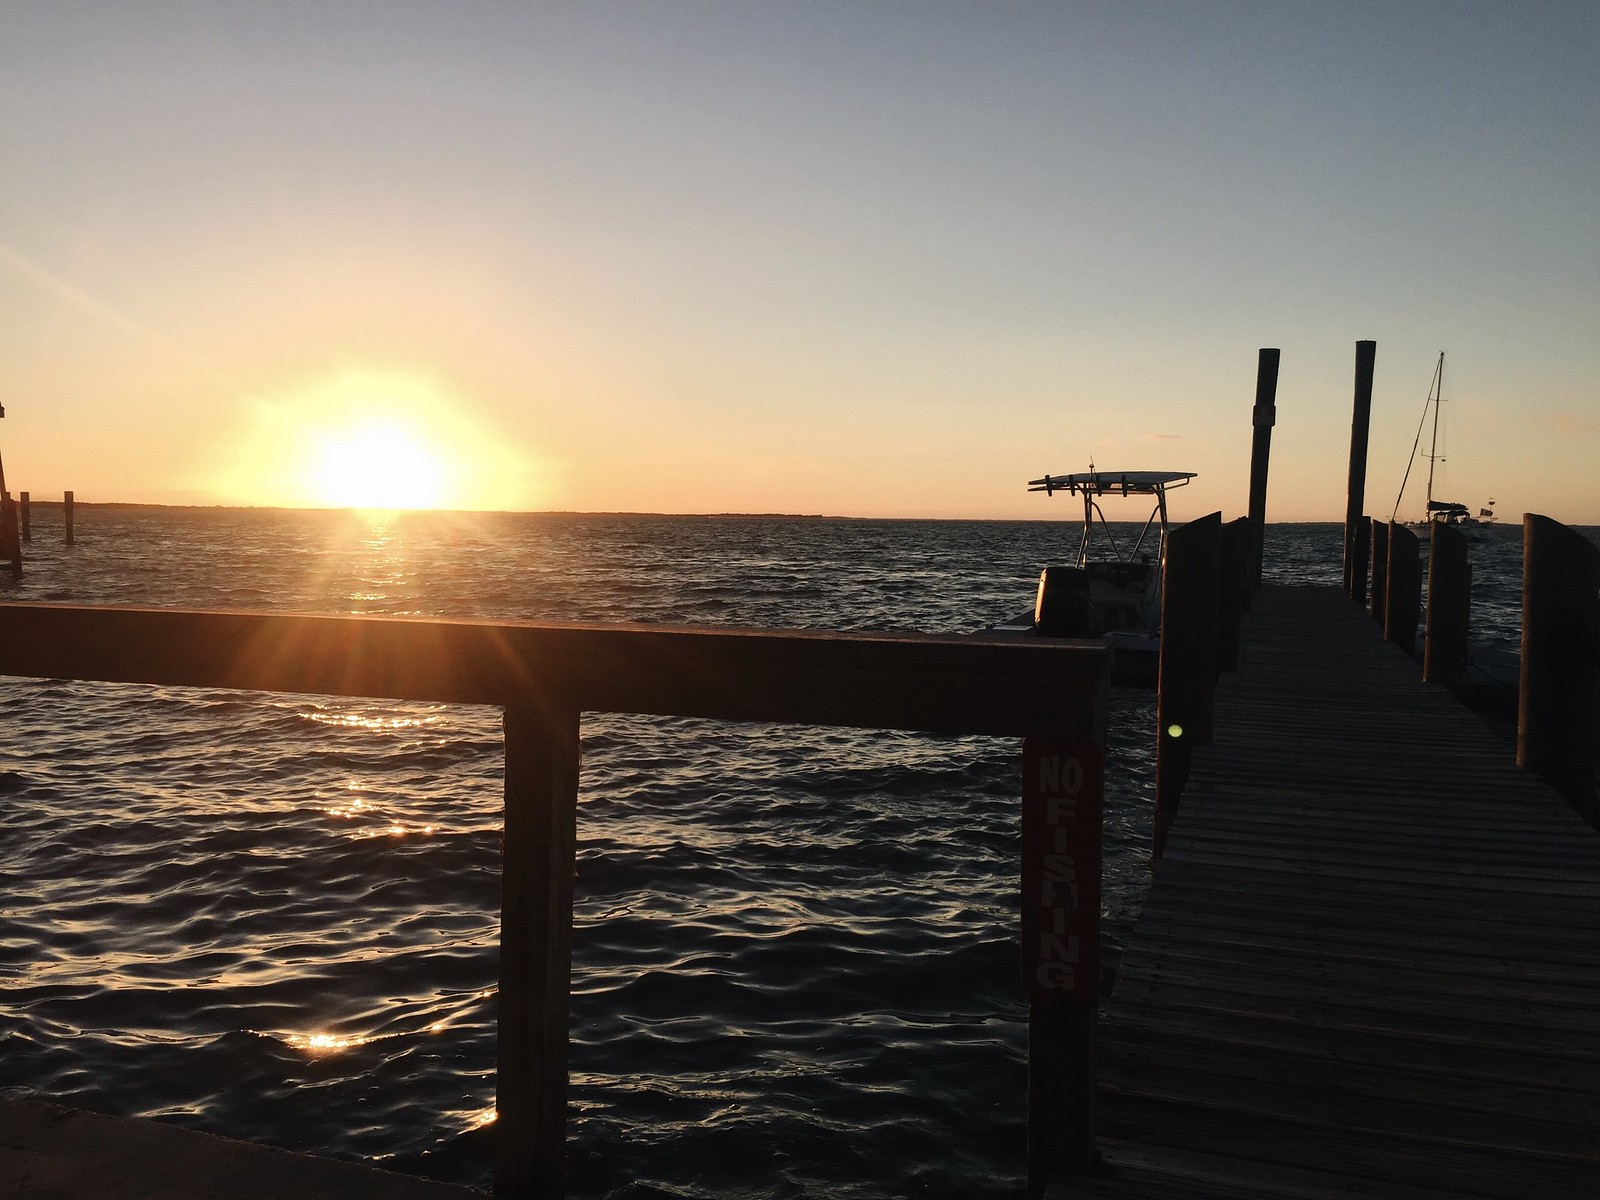 Caribbean Club Pier, Key Largo, Florida